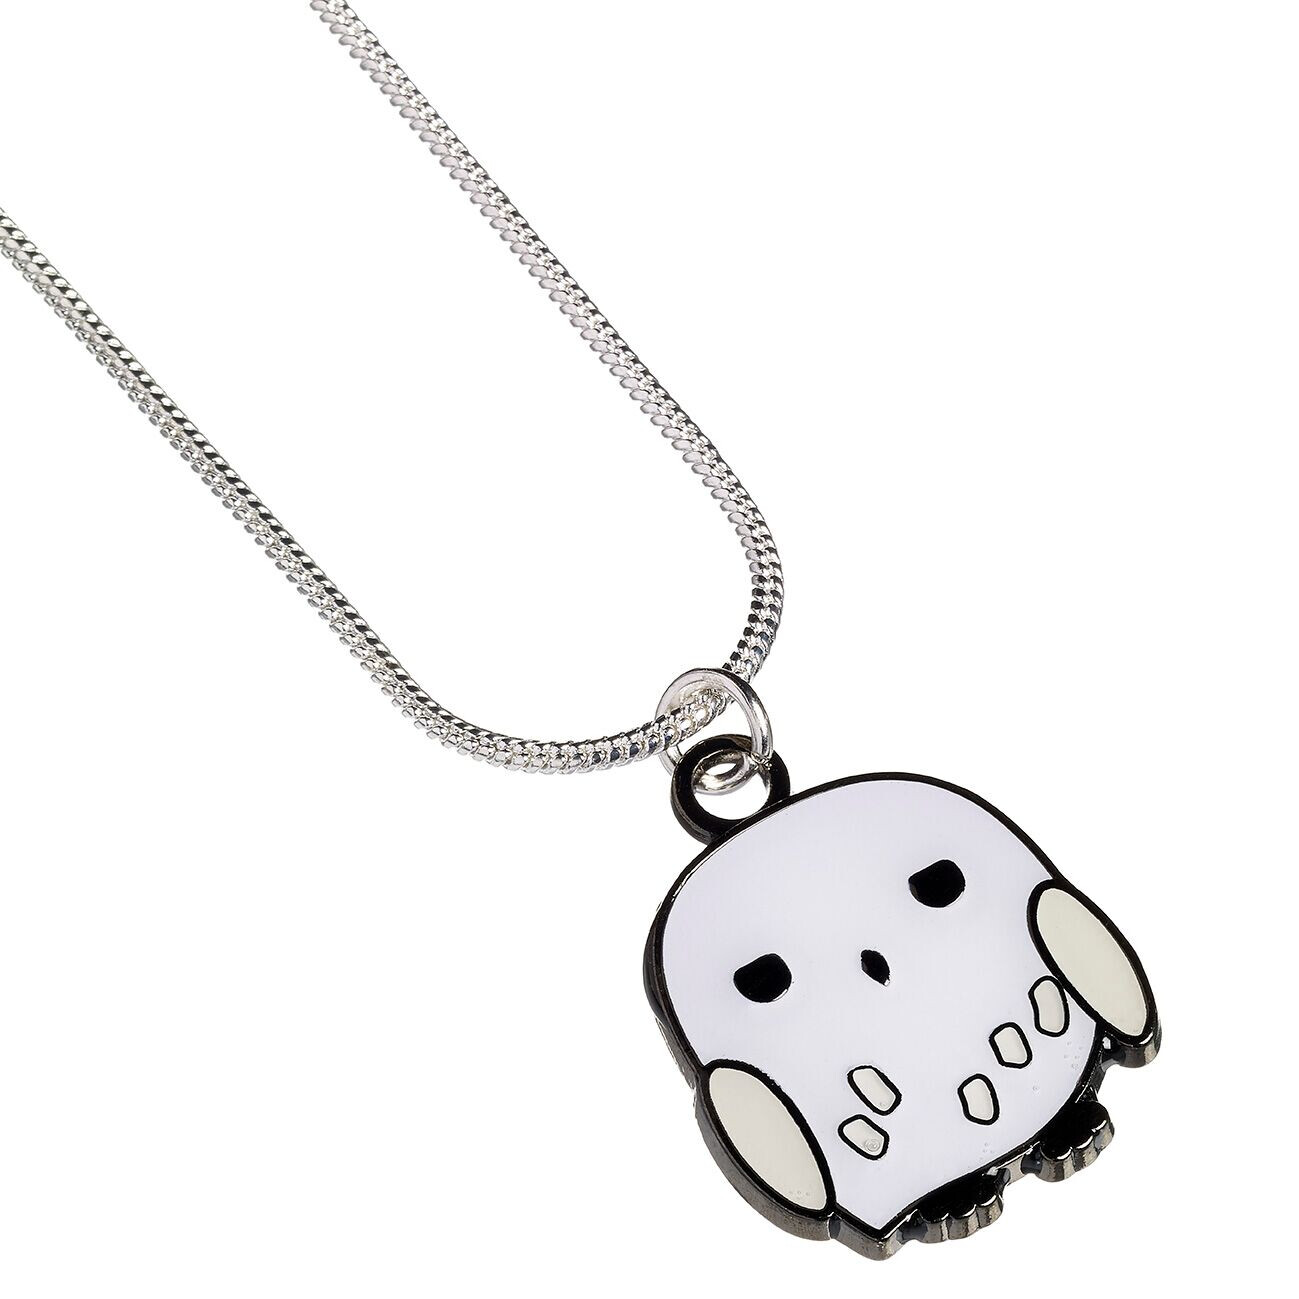 Hedwig Chibi Necklace